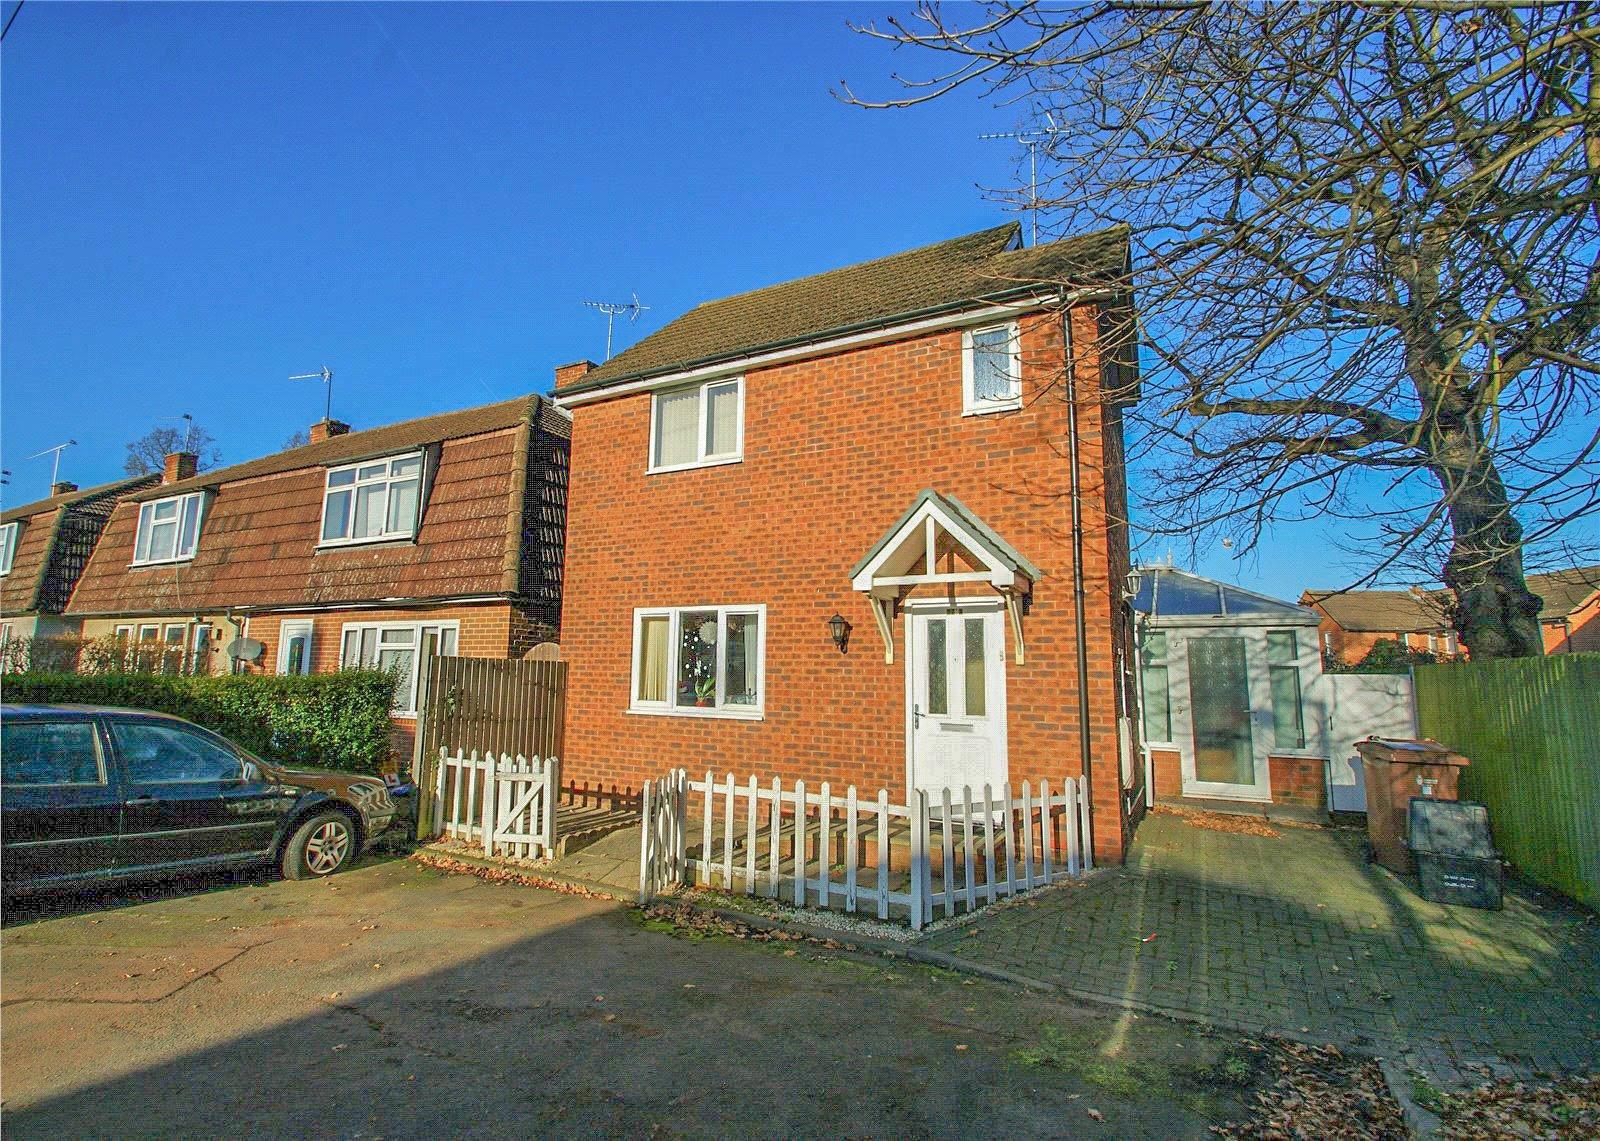 3 Bedrooms Detached House for sale in Norreys Avenue, Wokingham, Berkshire, RG40